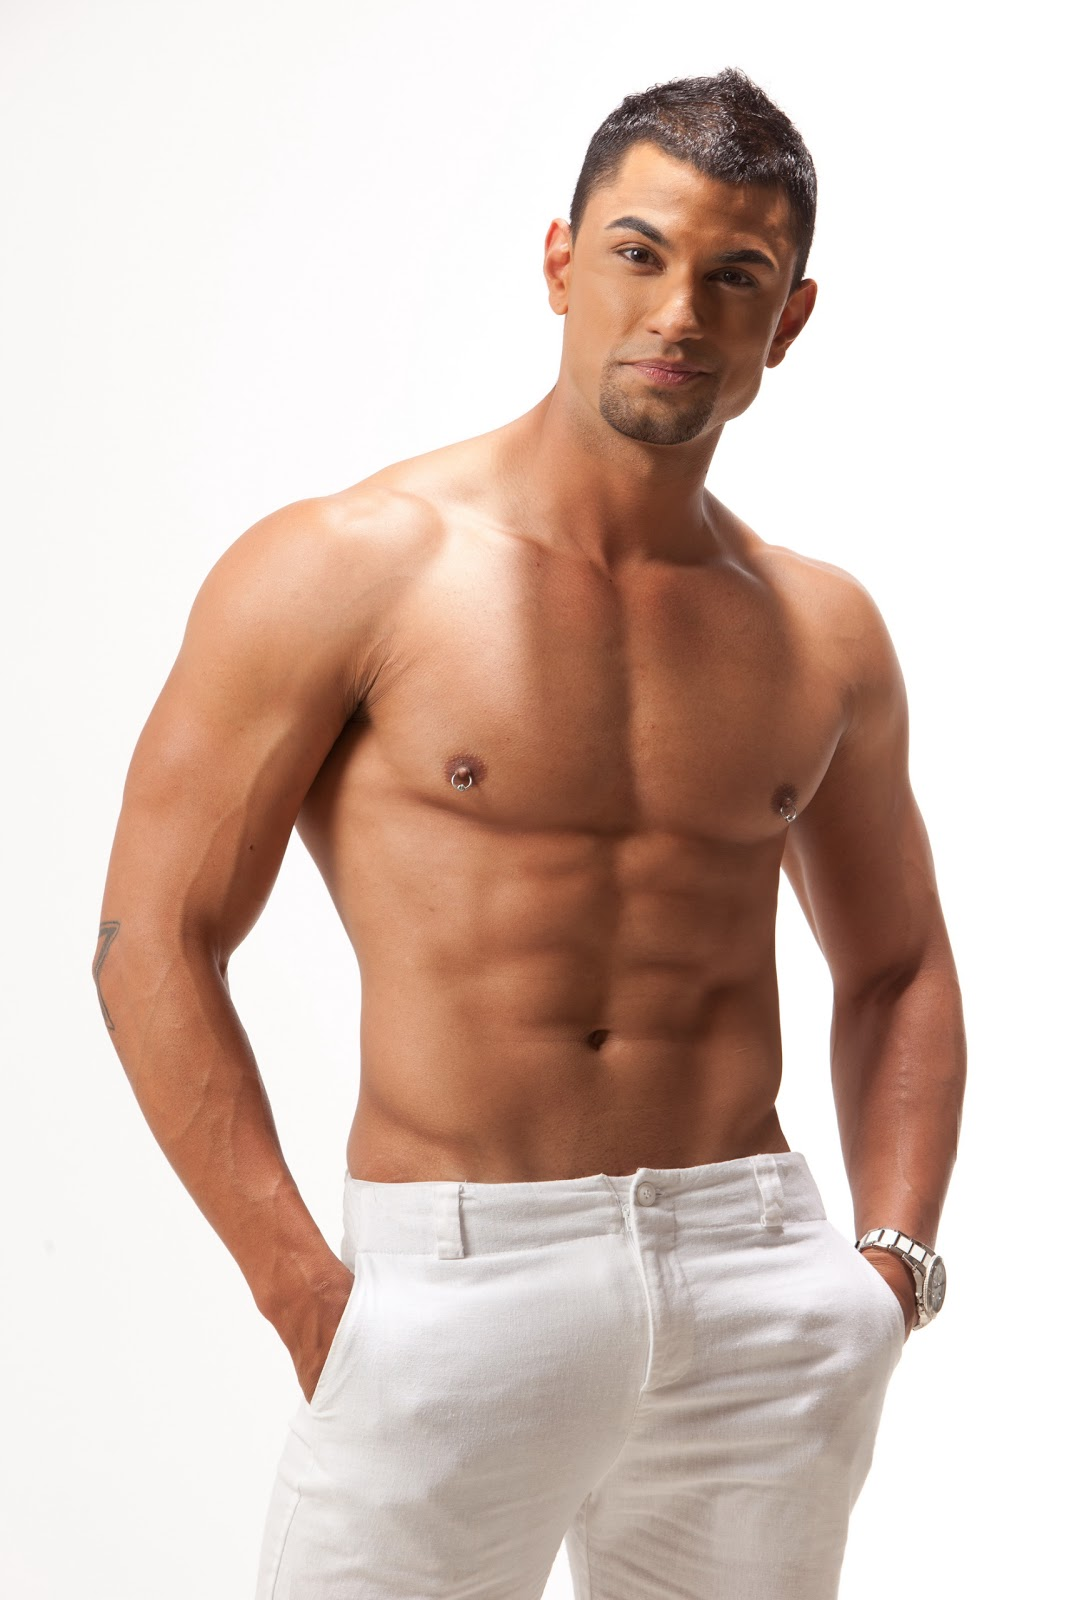 Tv With Thinus Rivals In Romance Presenter Jonaid Carrera -7513